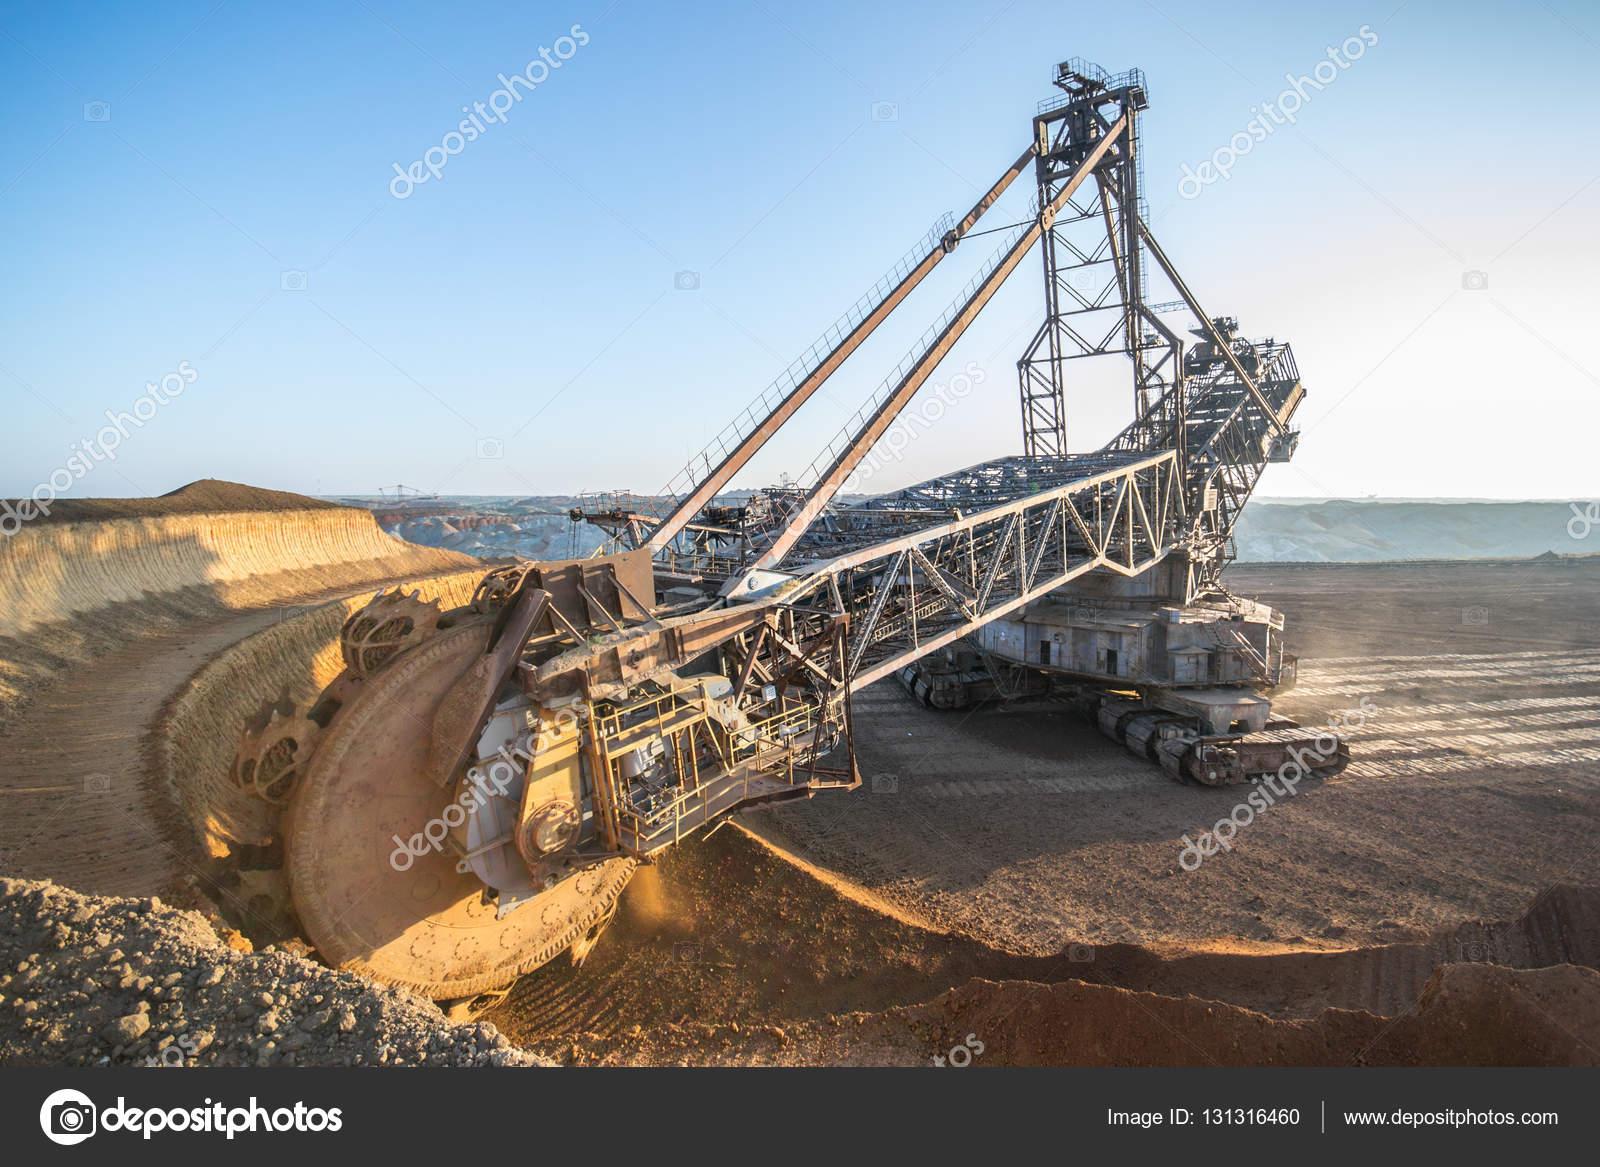 Biggest Excavator In The World Working Bagger 228 Ukraine Big Mine Develop Mineral Resources Excavator Digs Metallurgy In Ukraine Stock Photo C Mysokol 131316460